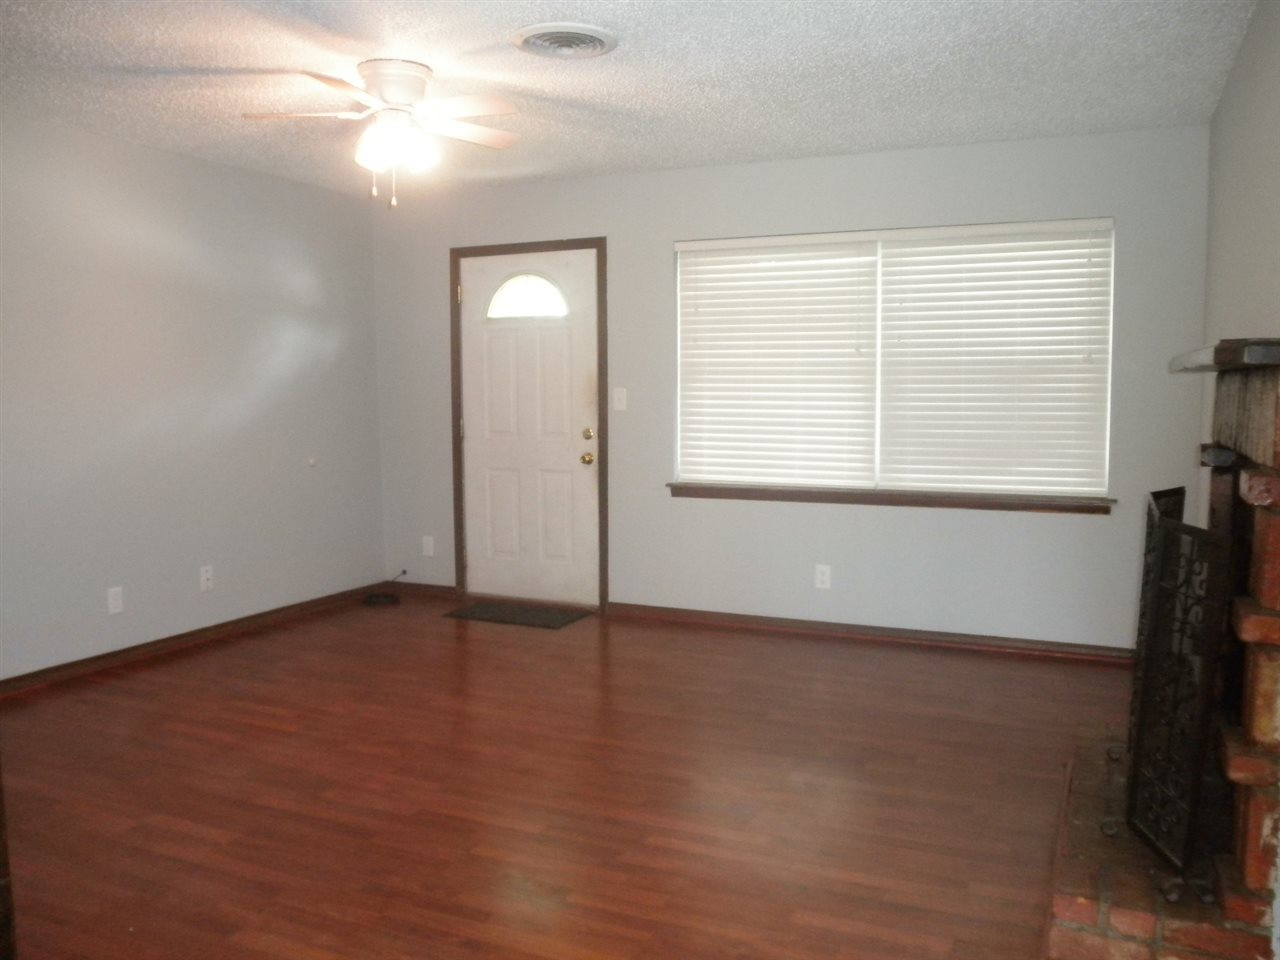 Sold Intraoffice W/MLS | 1209 N Ash Ponca City, OK 74601 2